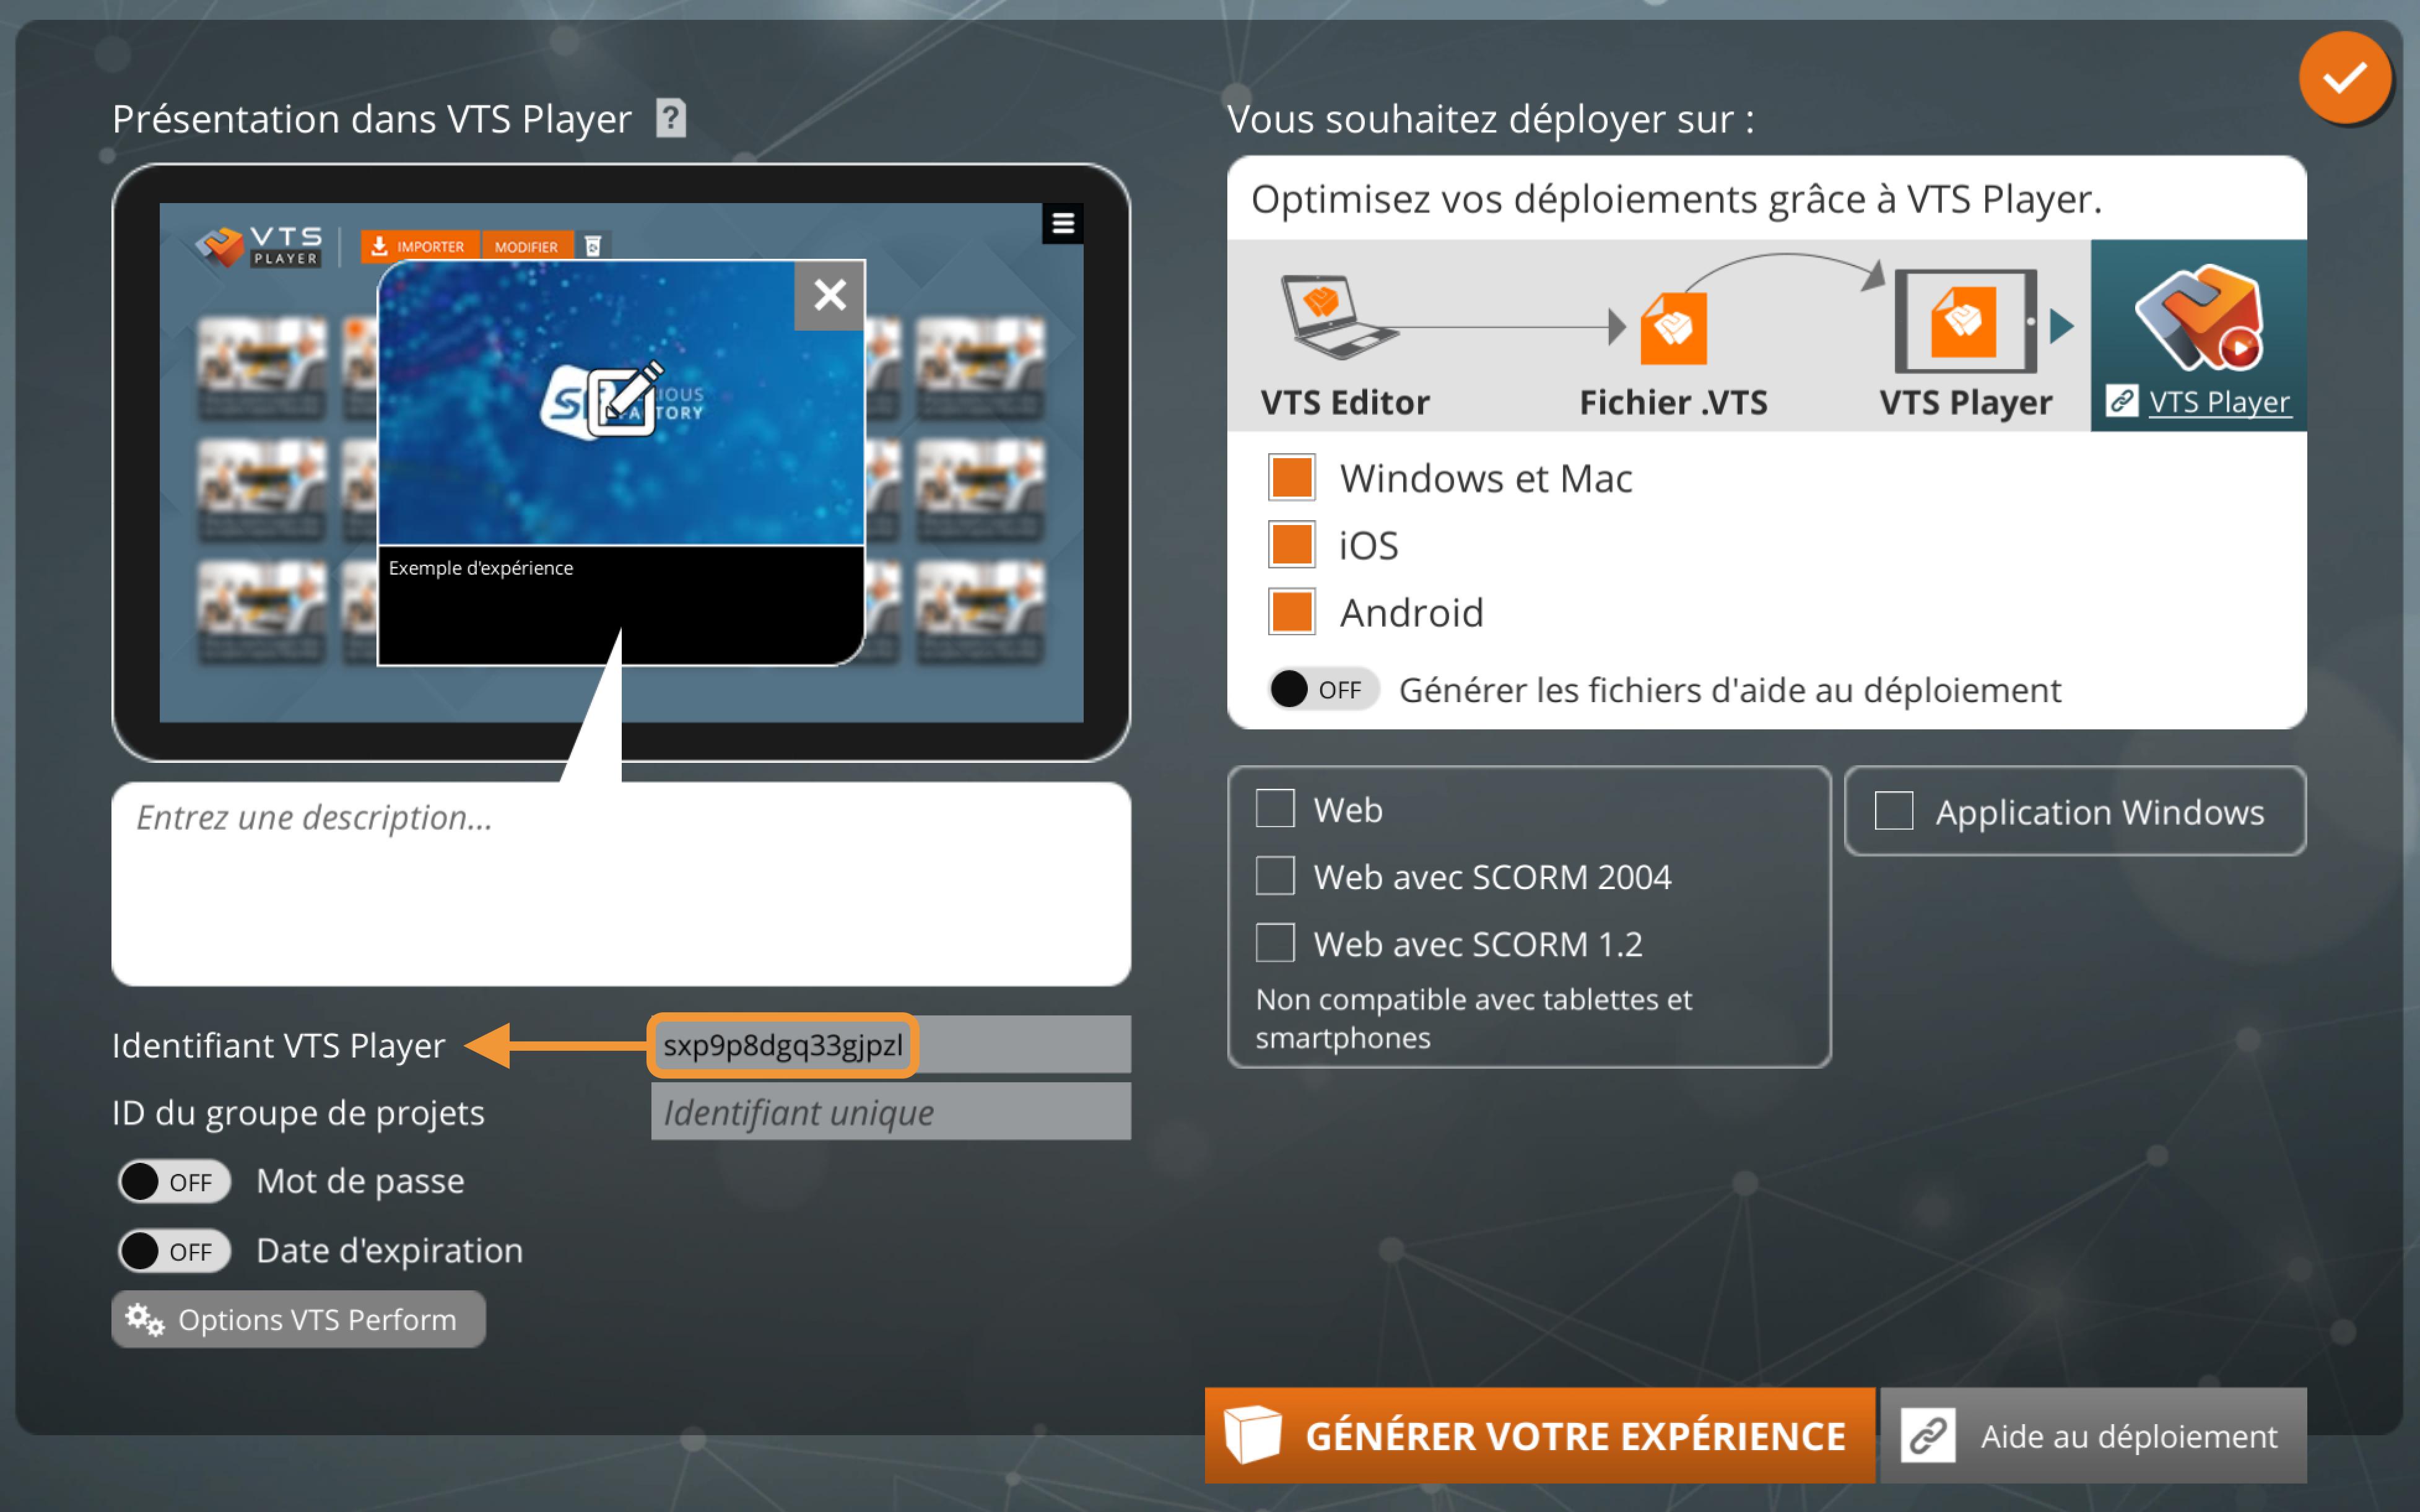 editor_generation_playerID_fr.png (1.33 MB)